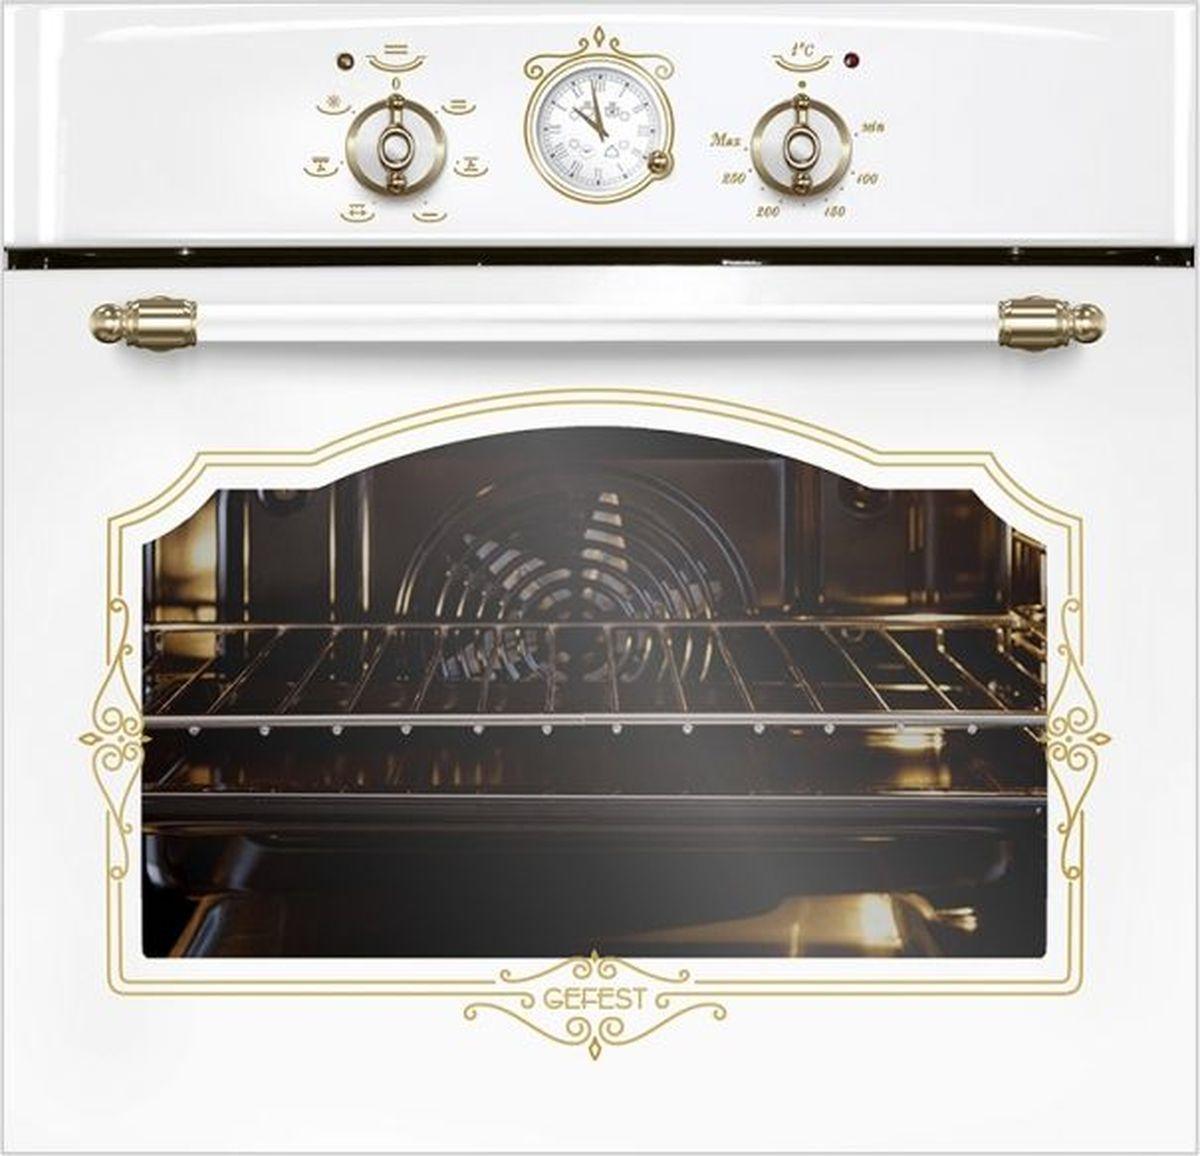 все цены на Духовой шкаф Gefest ЭДВ ДА 602-02 К82, белый онлайн